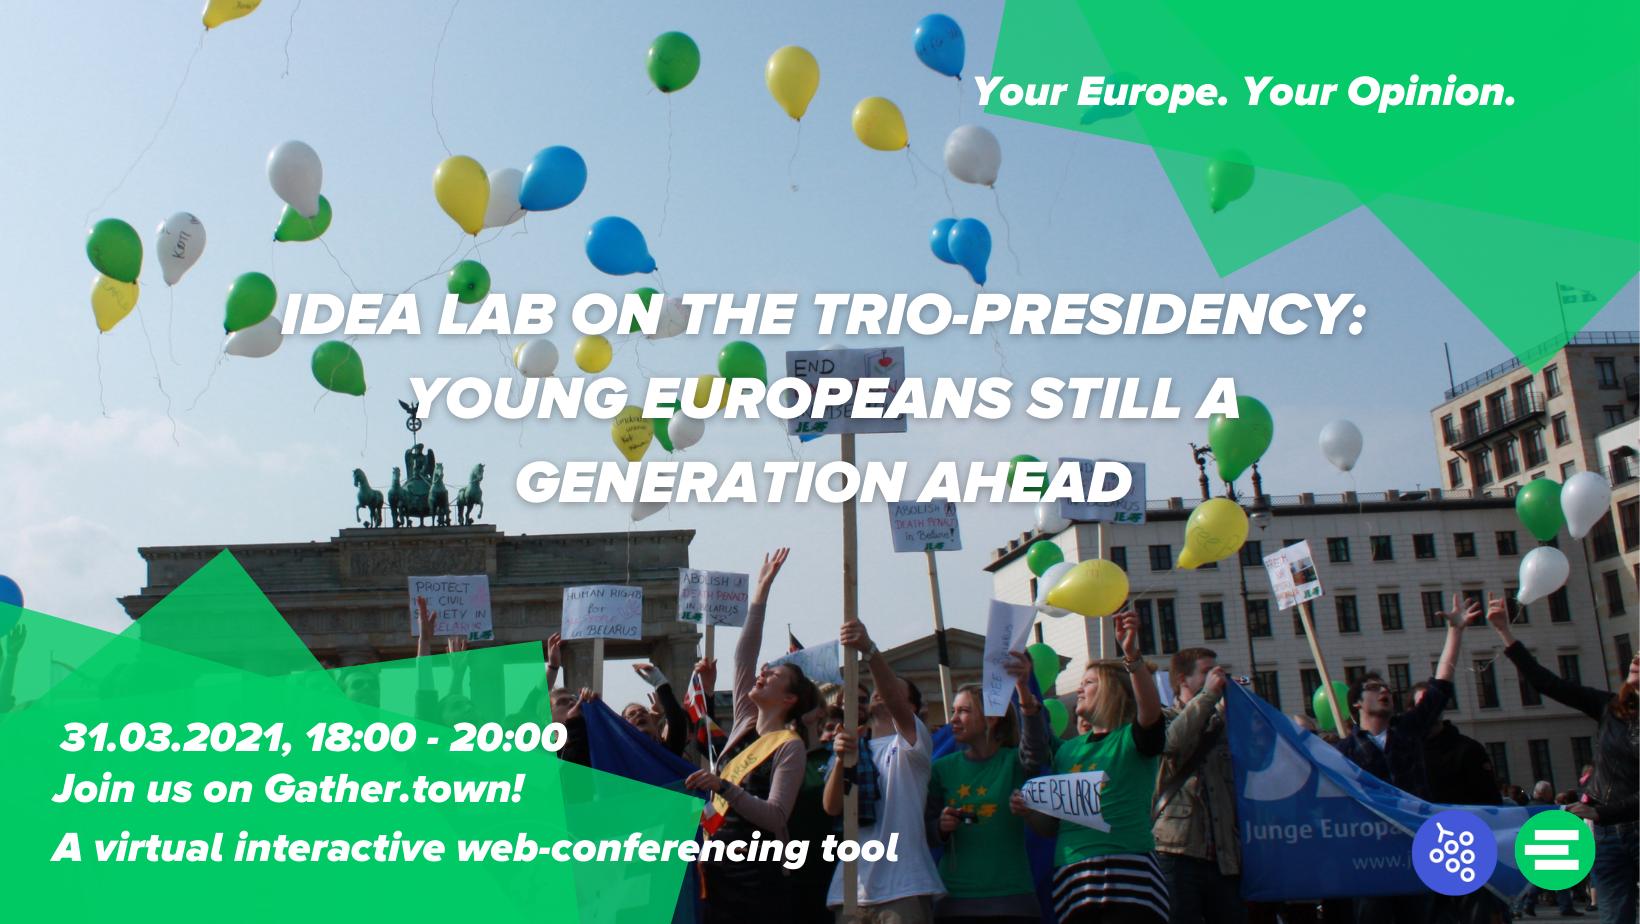 Idea lab on the trio-presidency: Young Europeans still a generation ahead